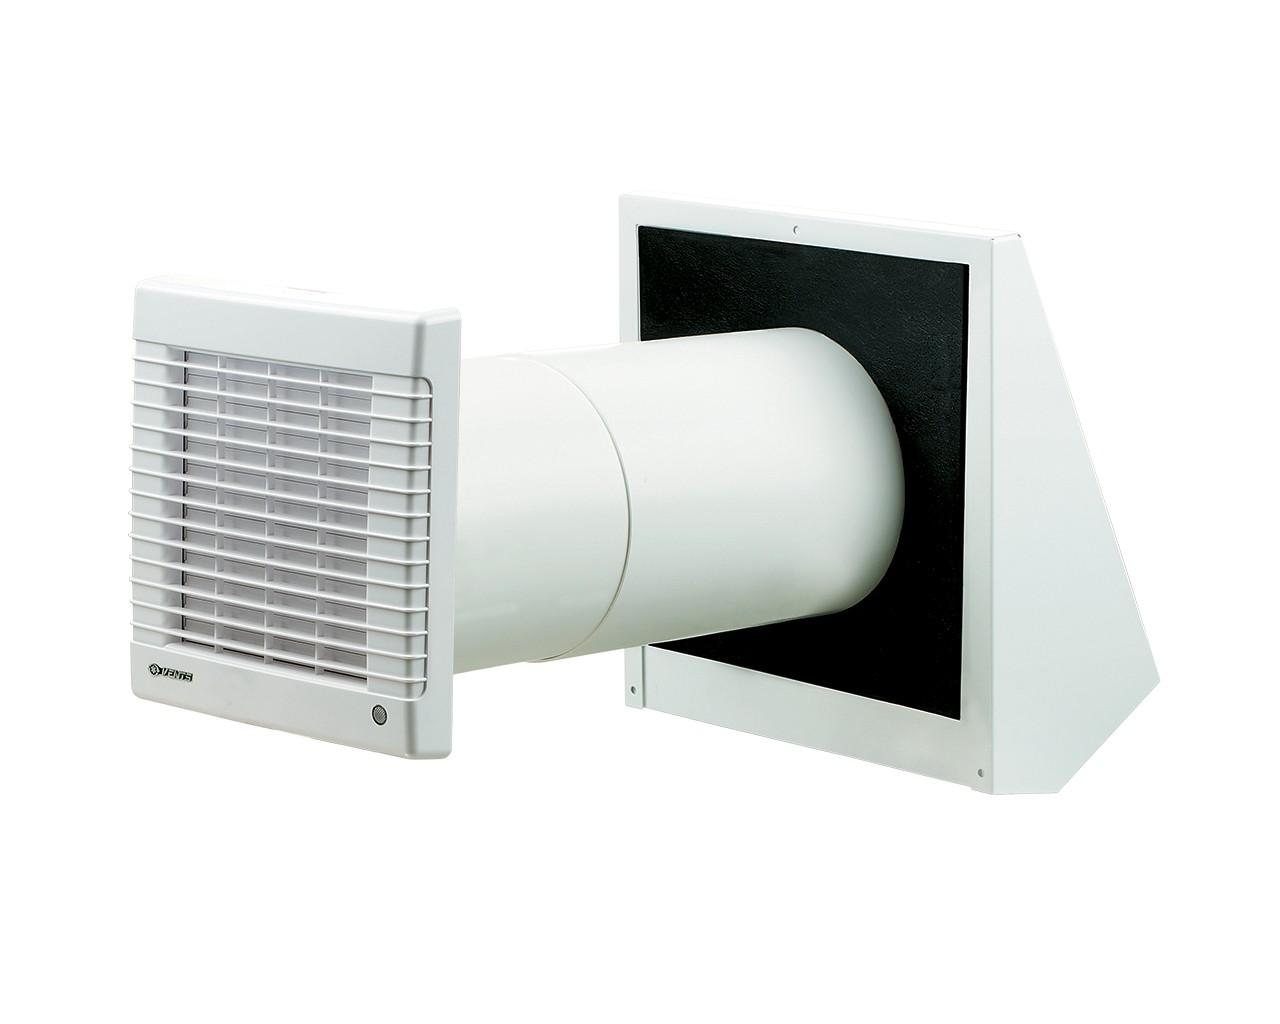 energy-saving ventilation system twinfresh standard series r-50, ra